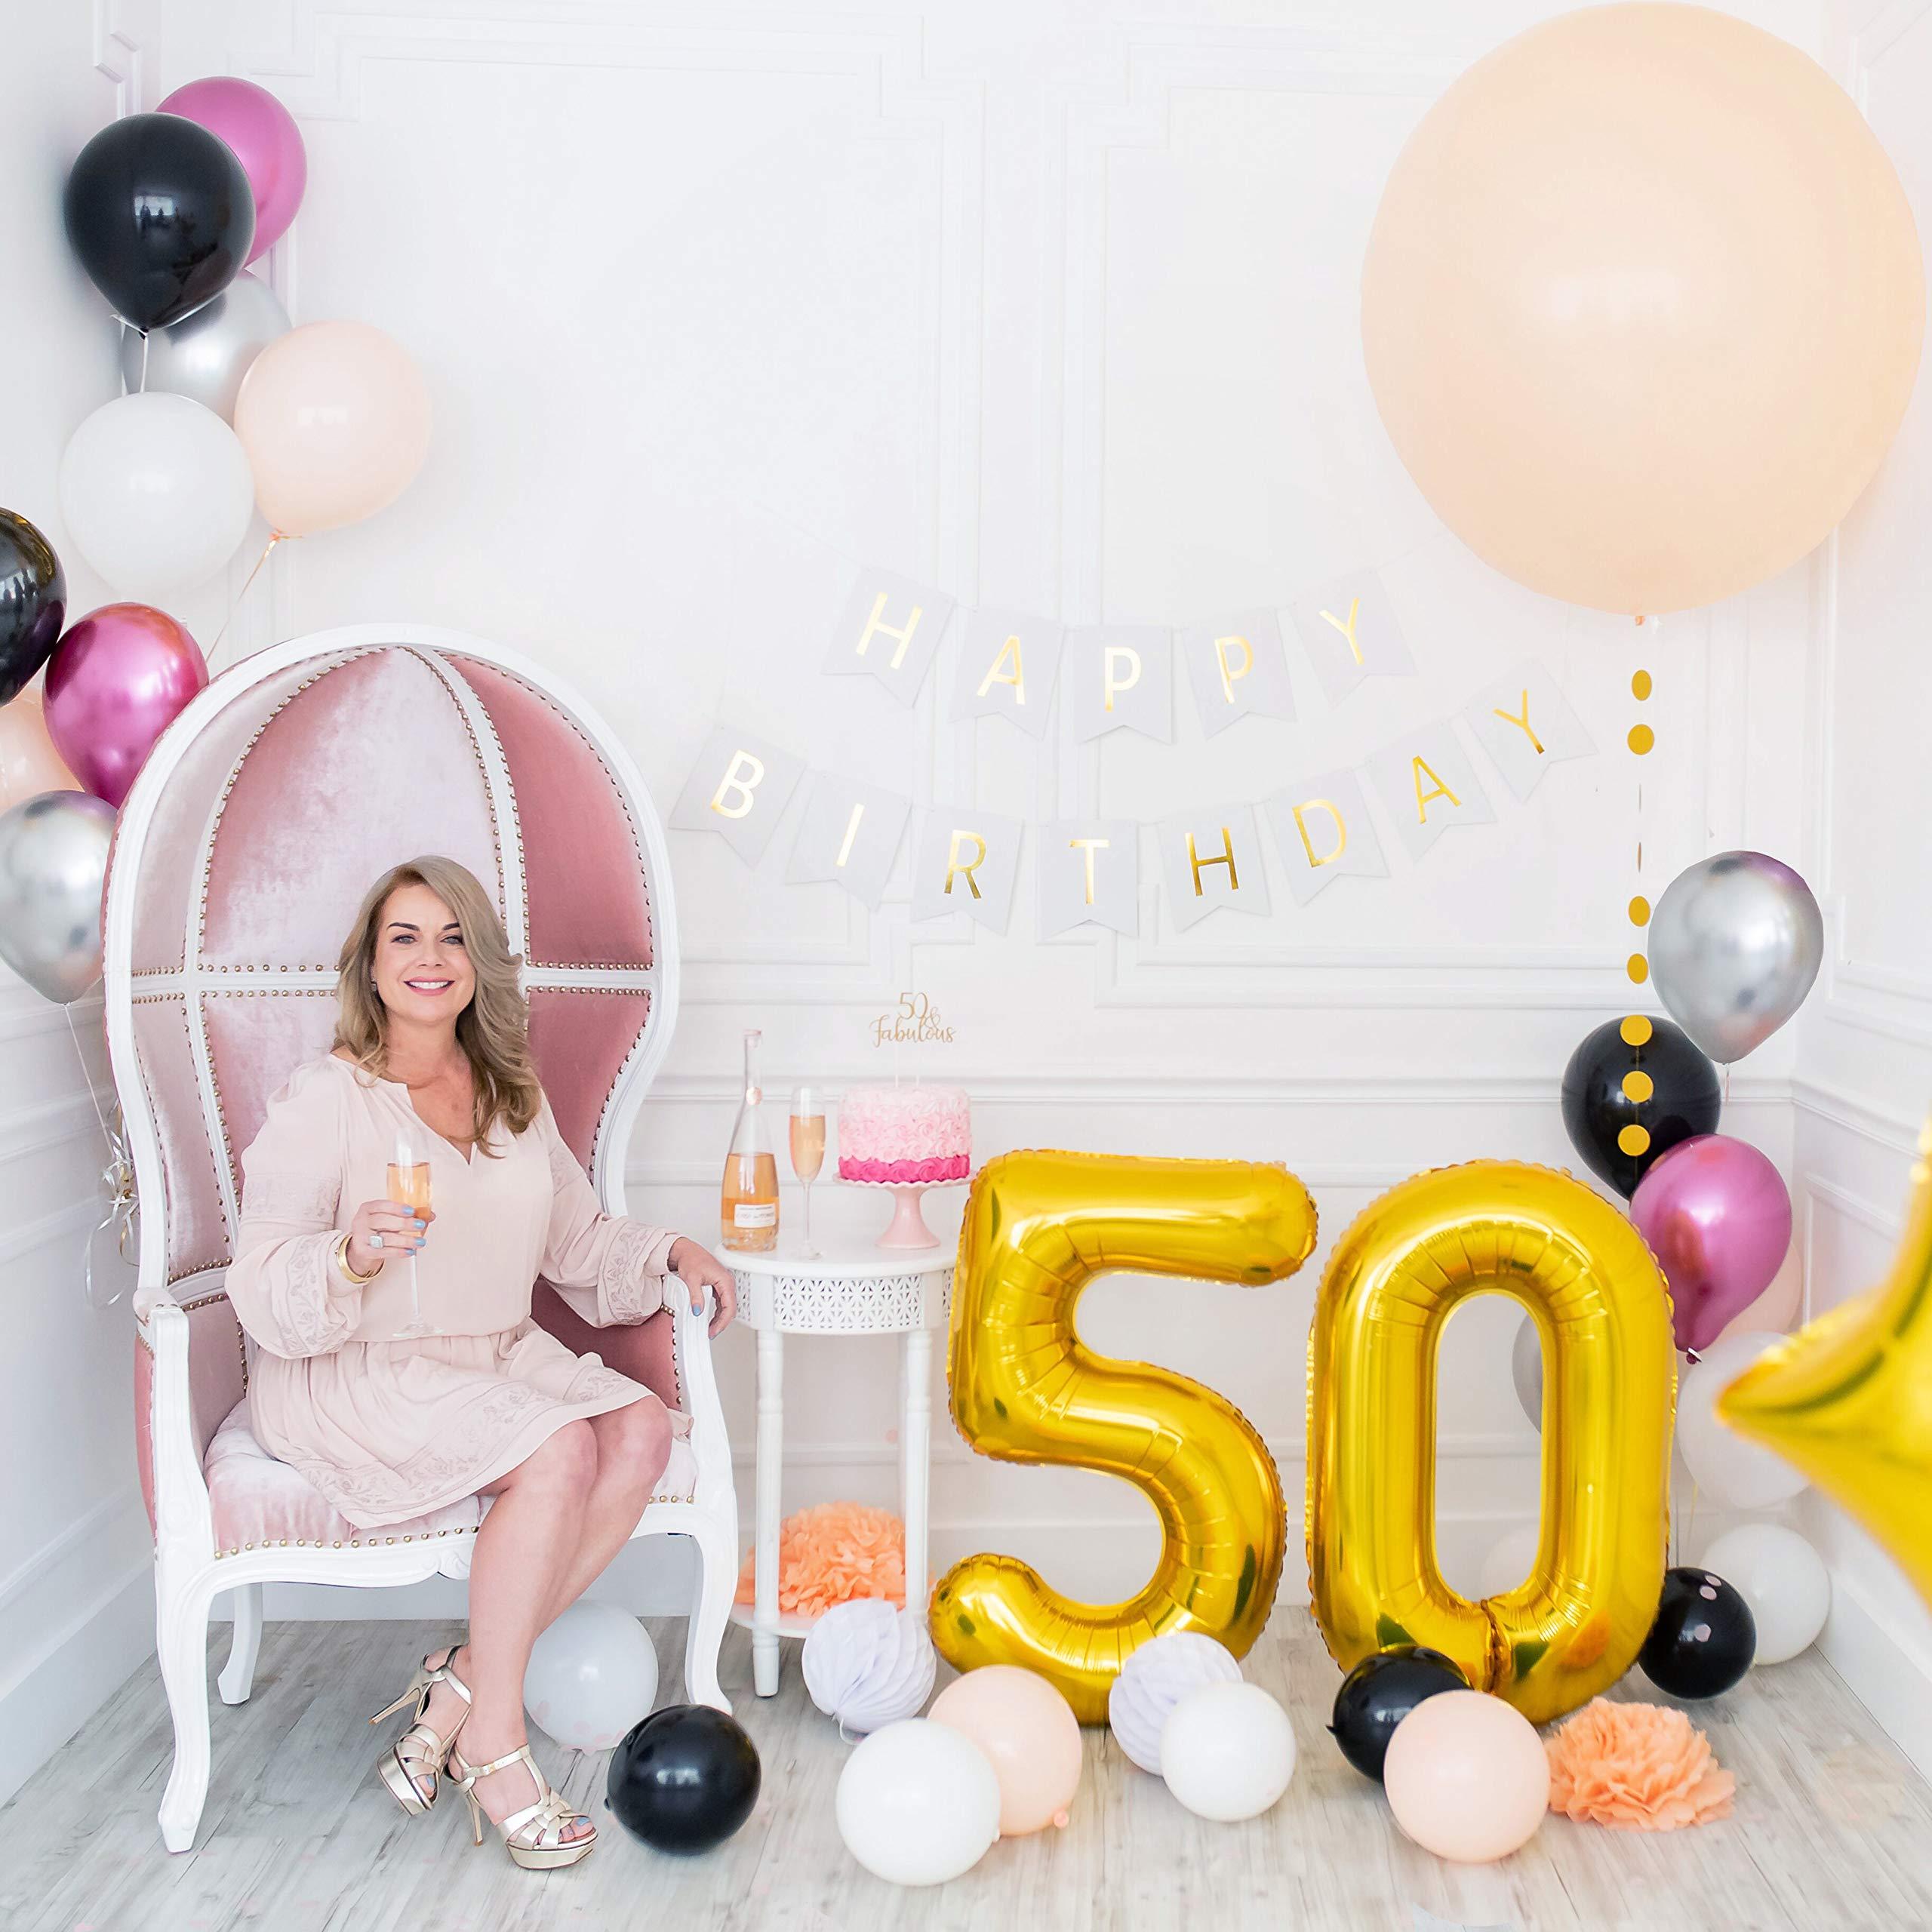 50 Shades of Fabulous Black Birthday Balloons Set of 3